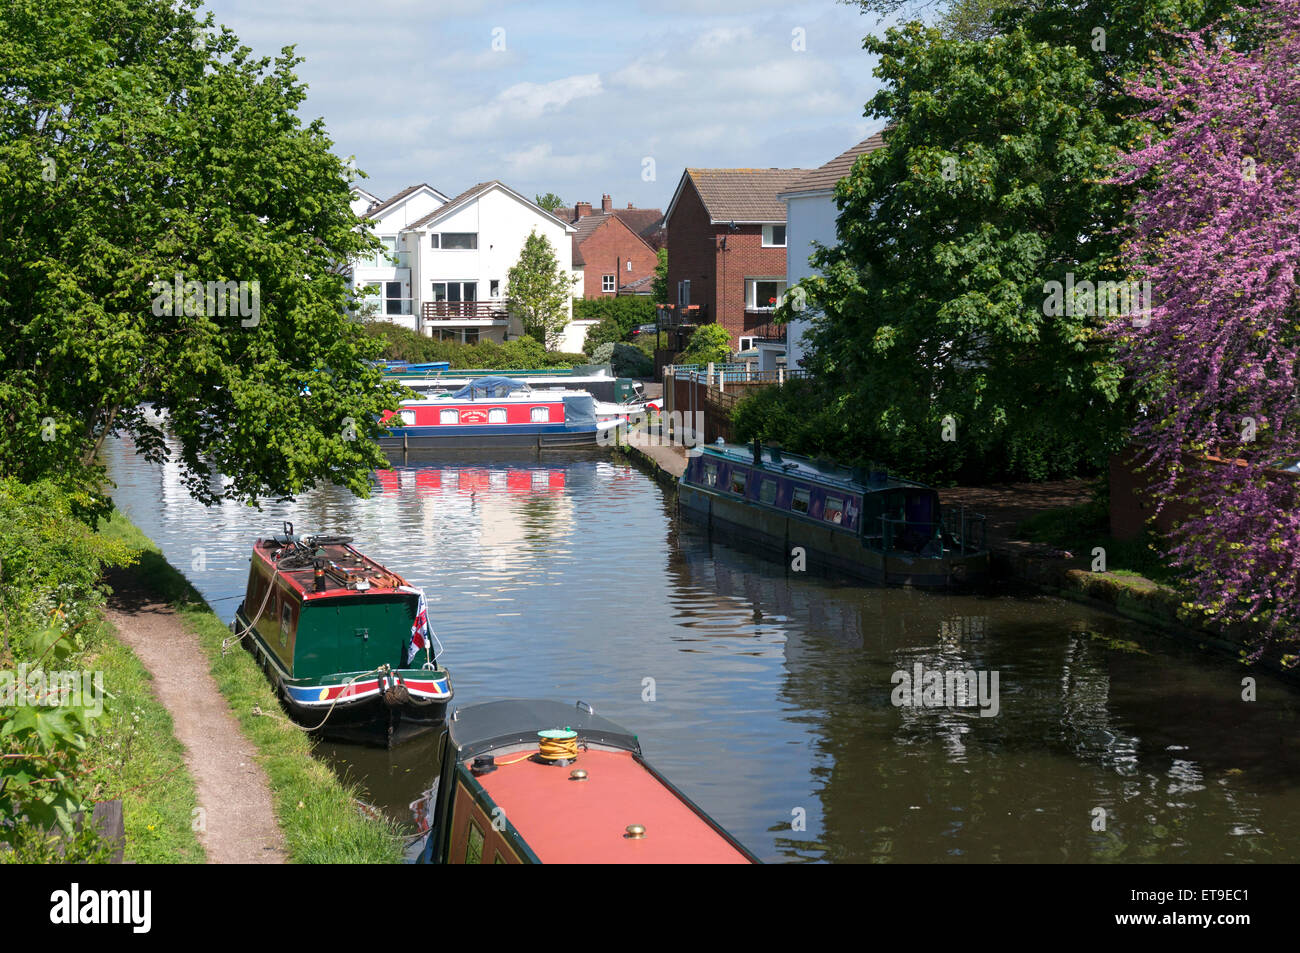 Bridgewater Canal at Stockton Heath, Cheshire - Stock Image